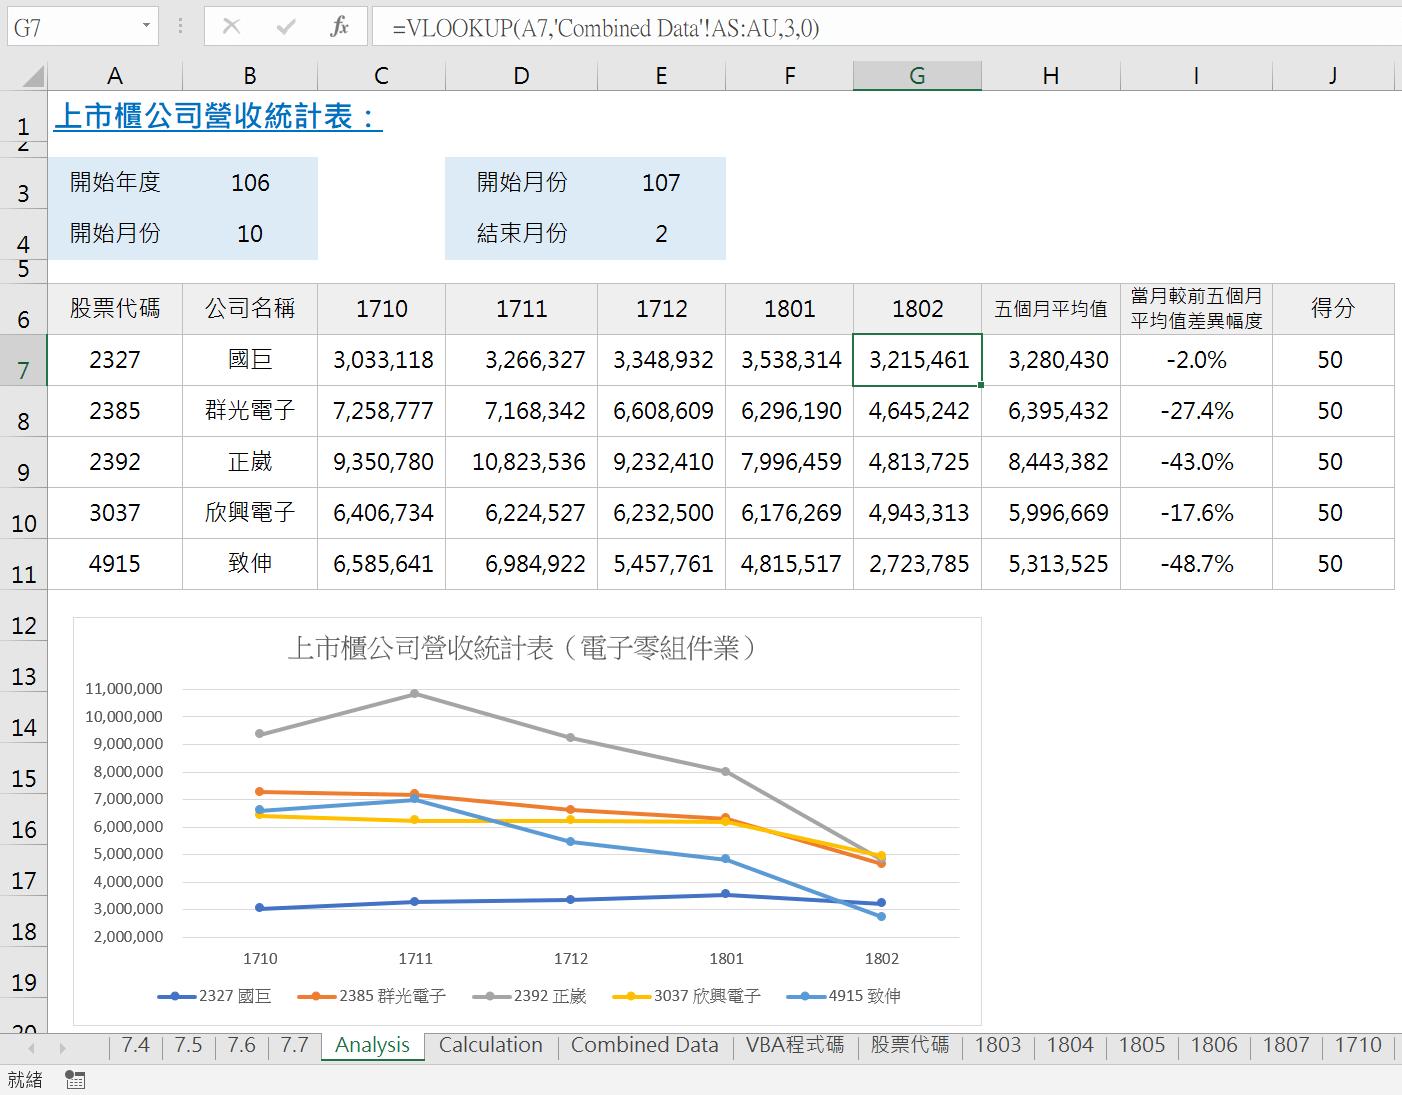 Excel VBA網路爬蟲,5家公司5個月份營業收入統計 VBA財務分析 第12張